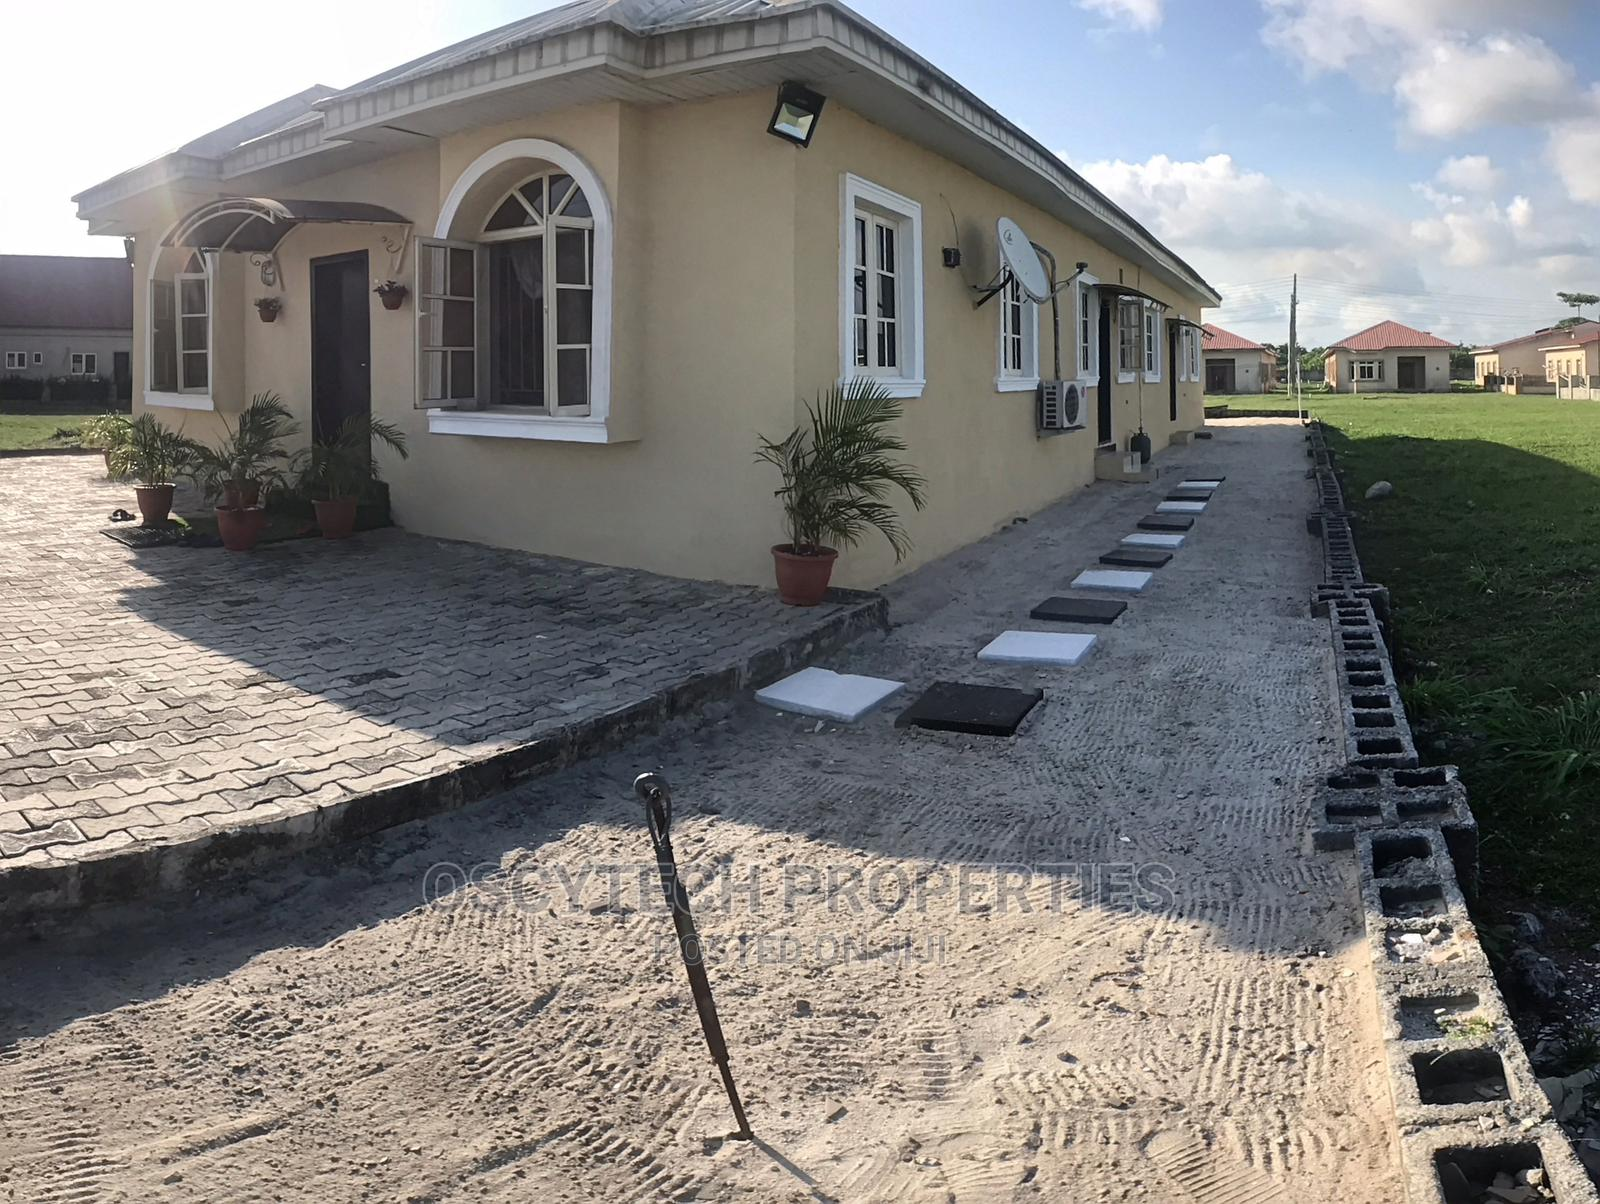 2 Bedrooms Bungalow for Rent in Adiva Estate In, Ibeju